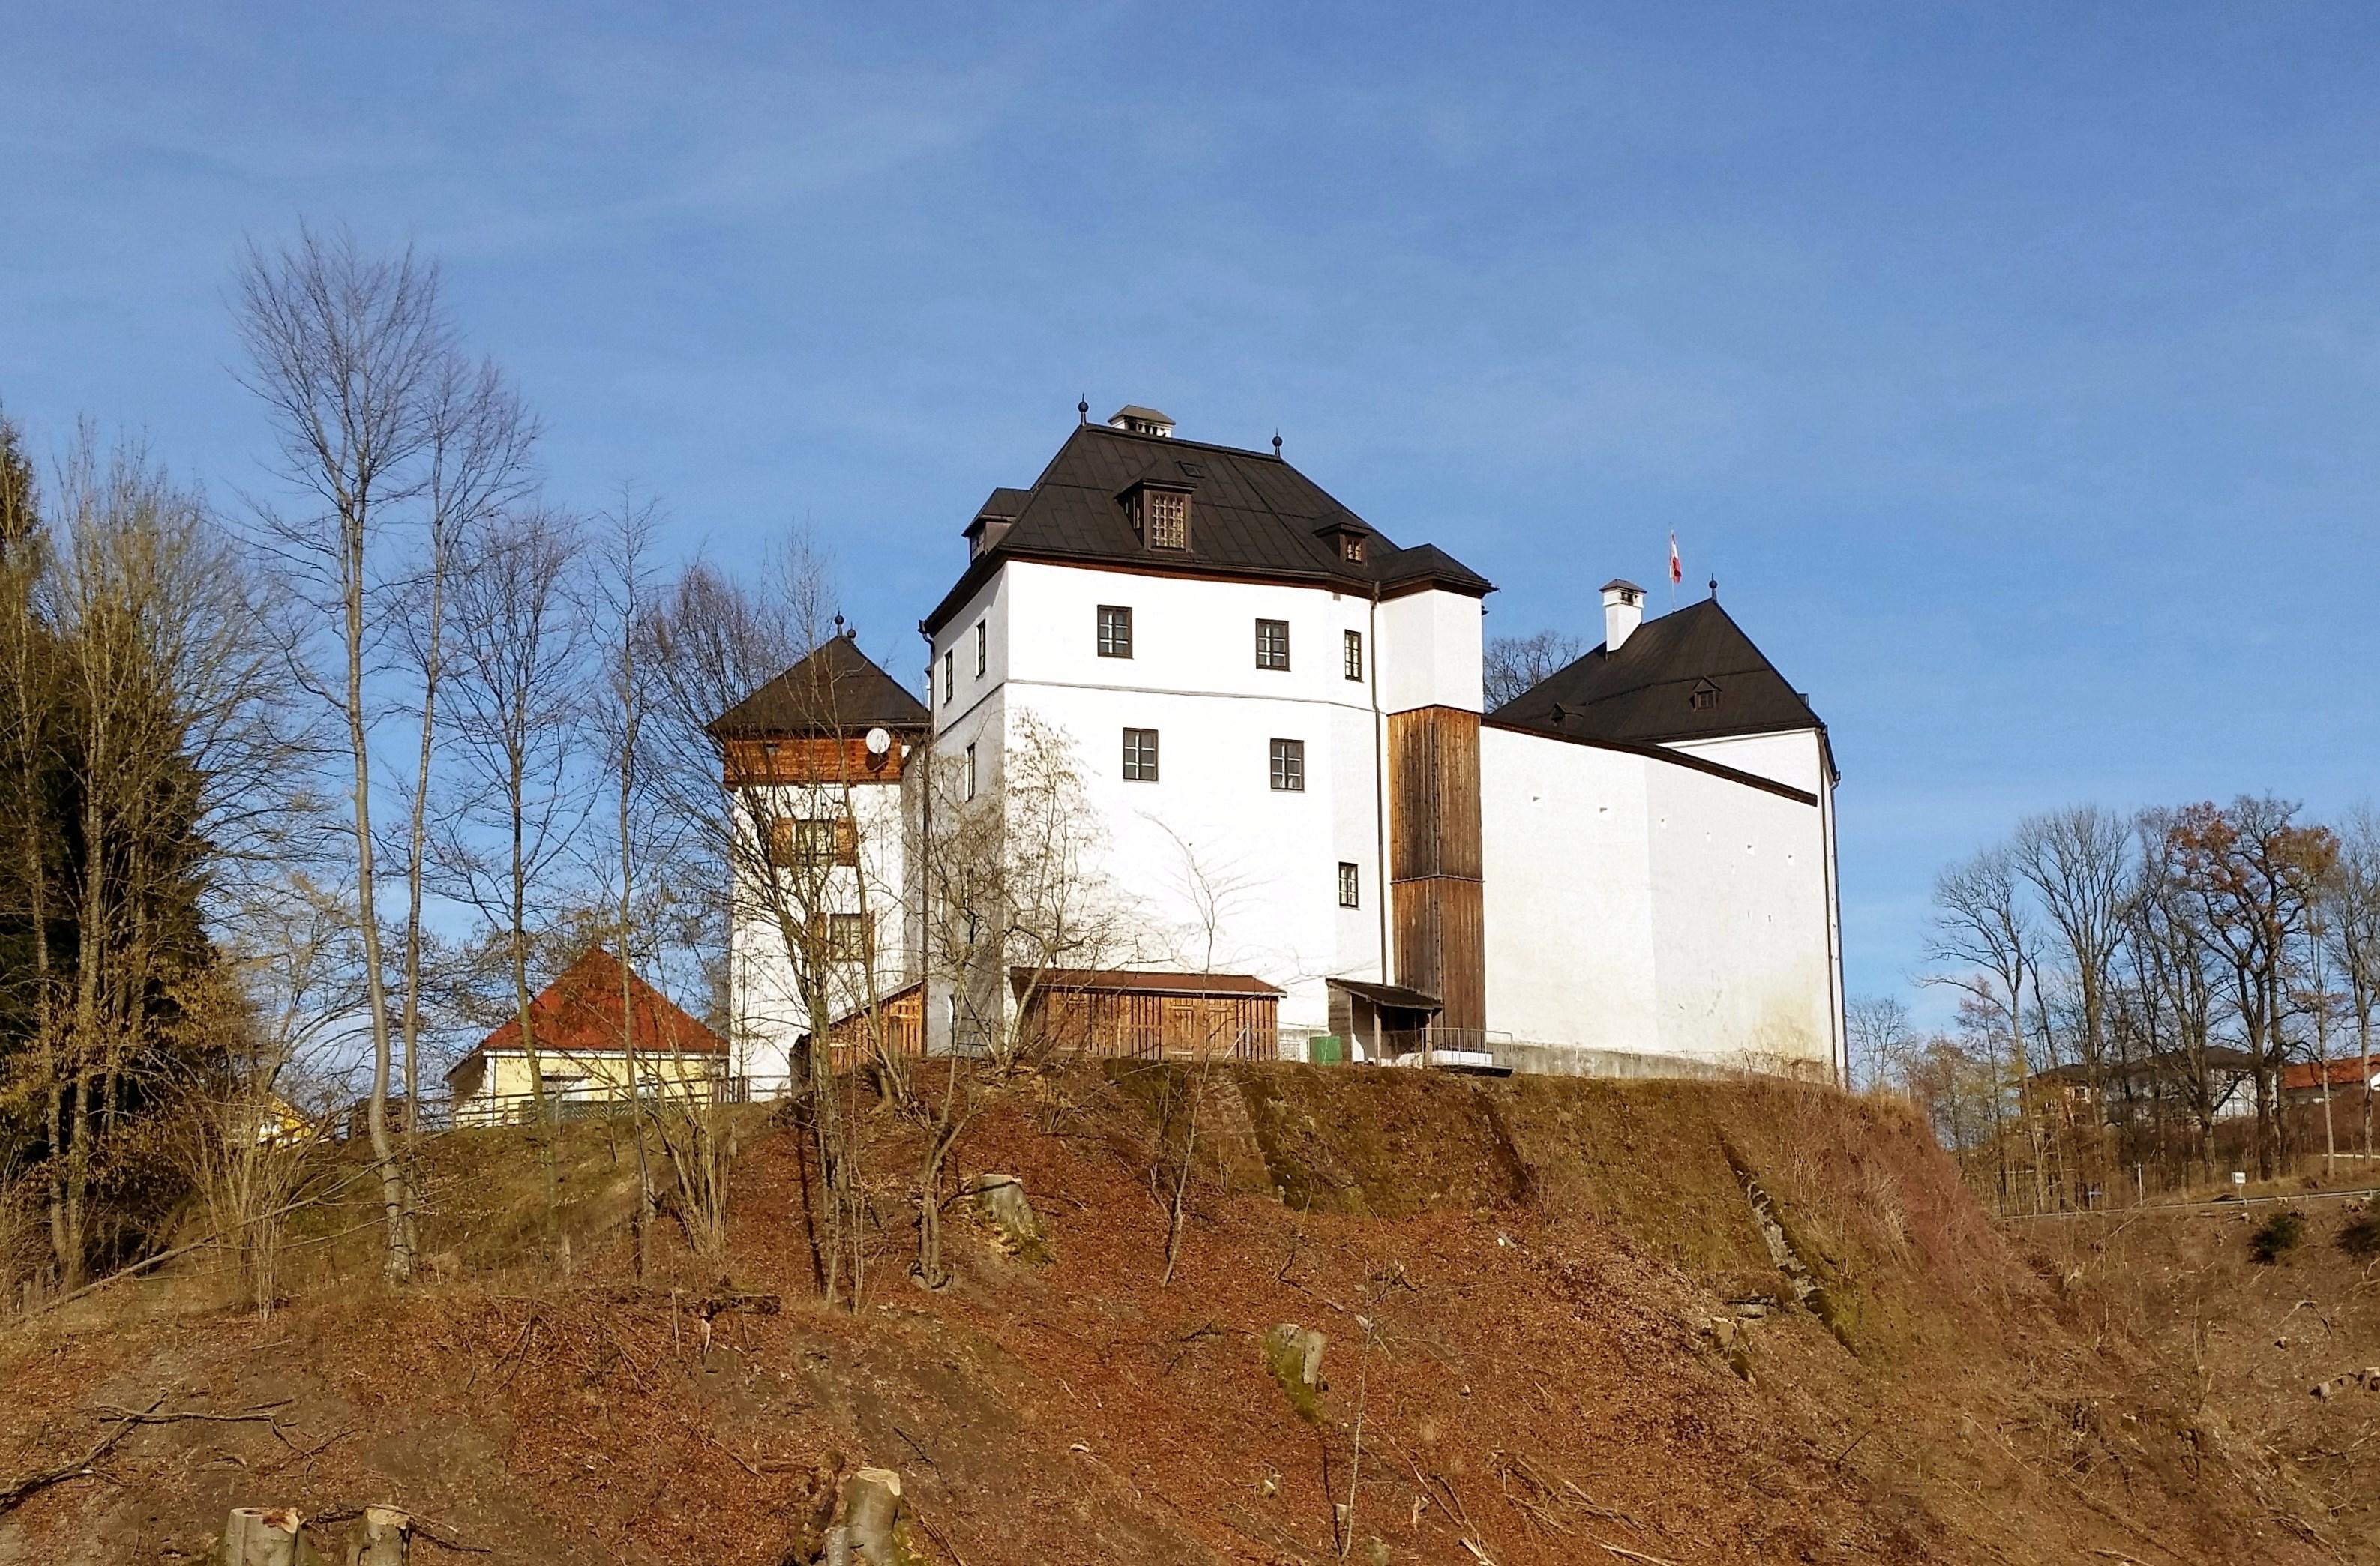 Rechnungsabschluss St. Pantaleon 2015 (Statistik Austria